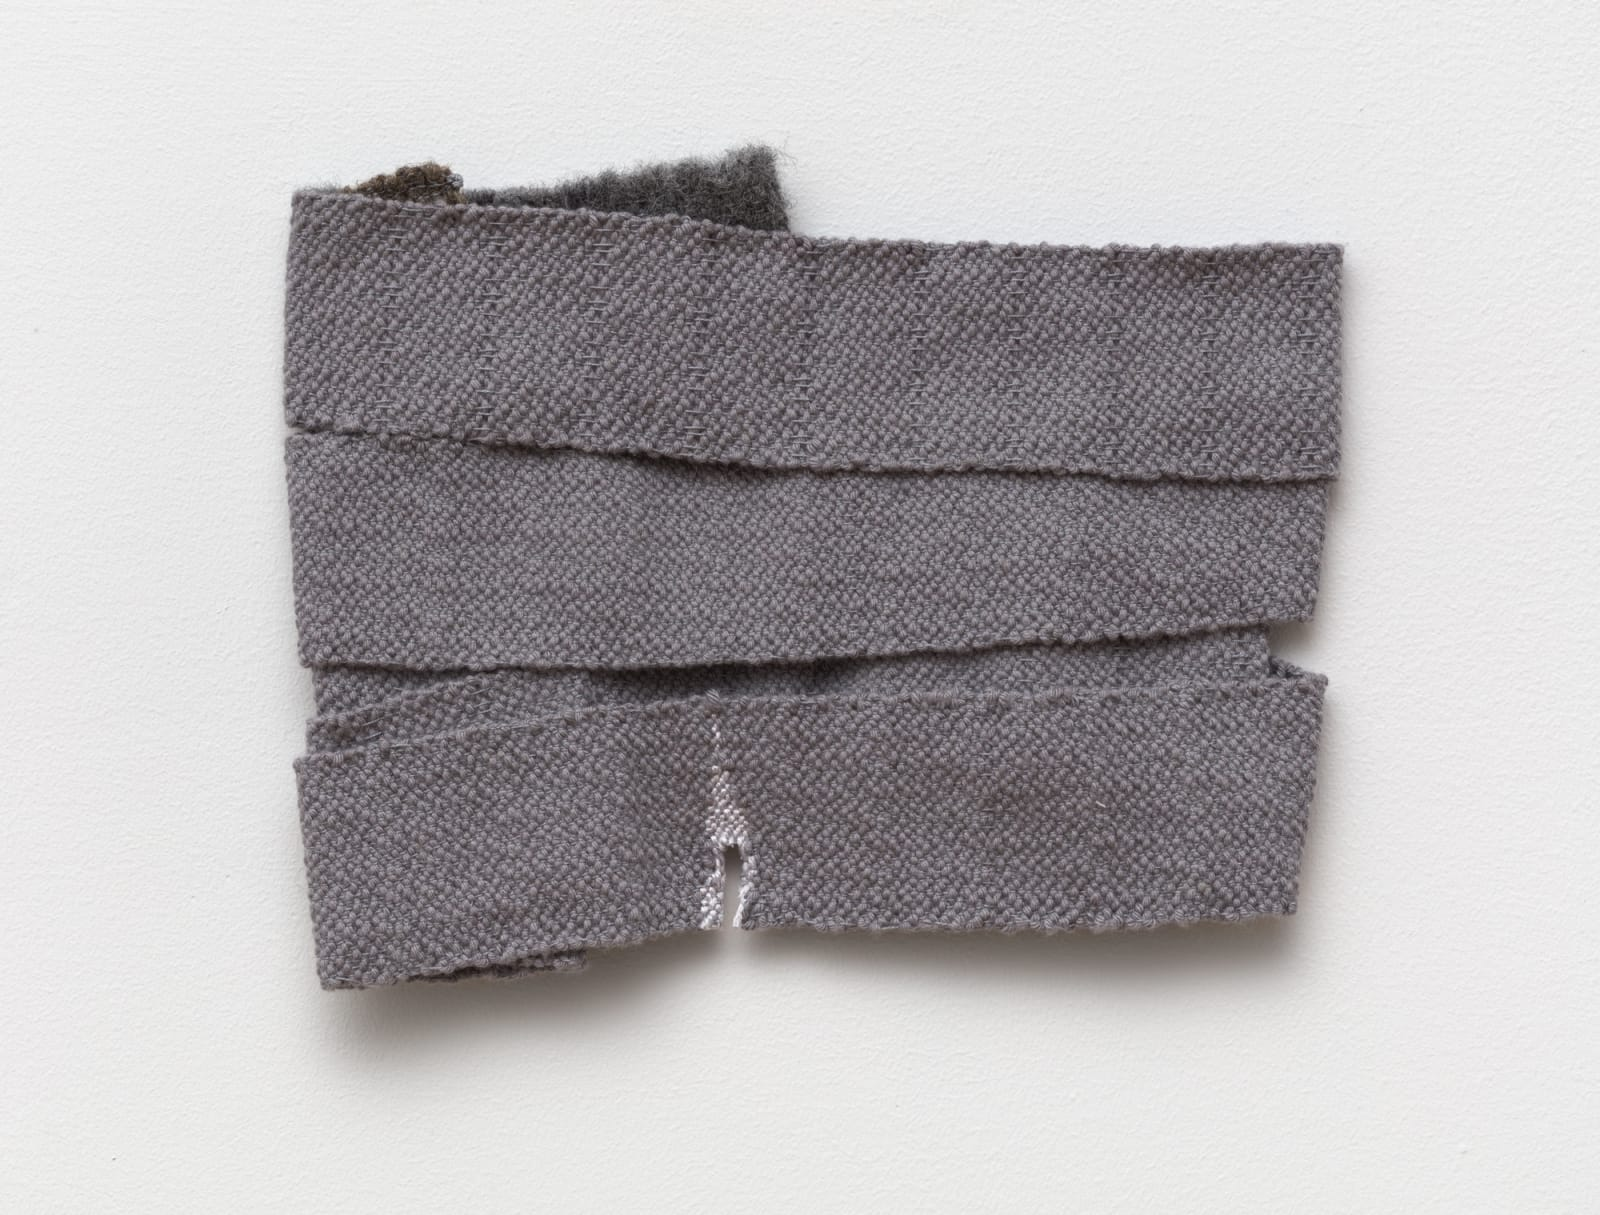 Hana Miletić (b. 1982) Materials, 2019 hand-woven textile 6 5/8 x 8 5/8 x 1/8 in (16.8 x 21.9 x 0.3 cm) (MIL7817)